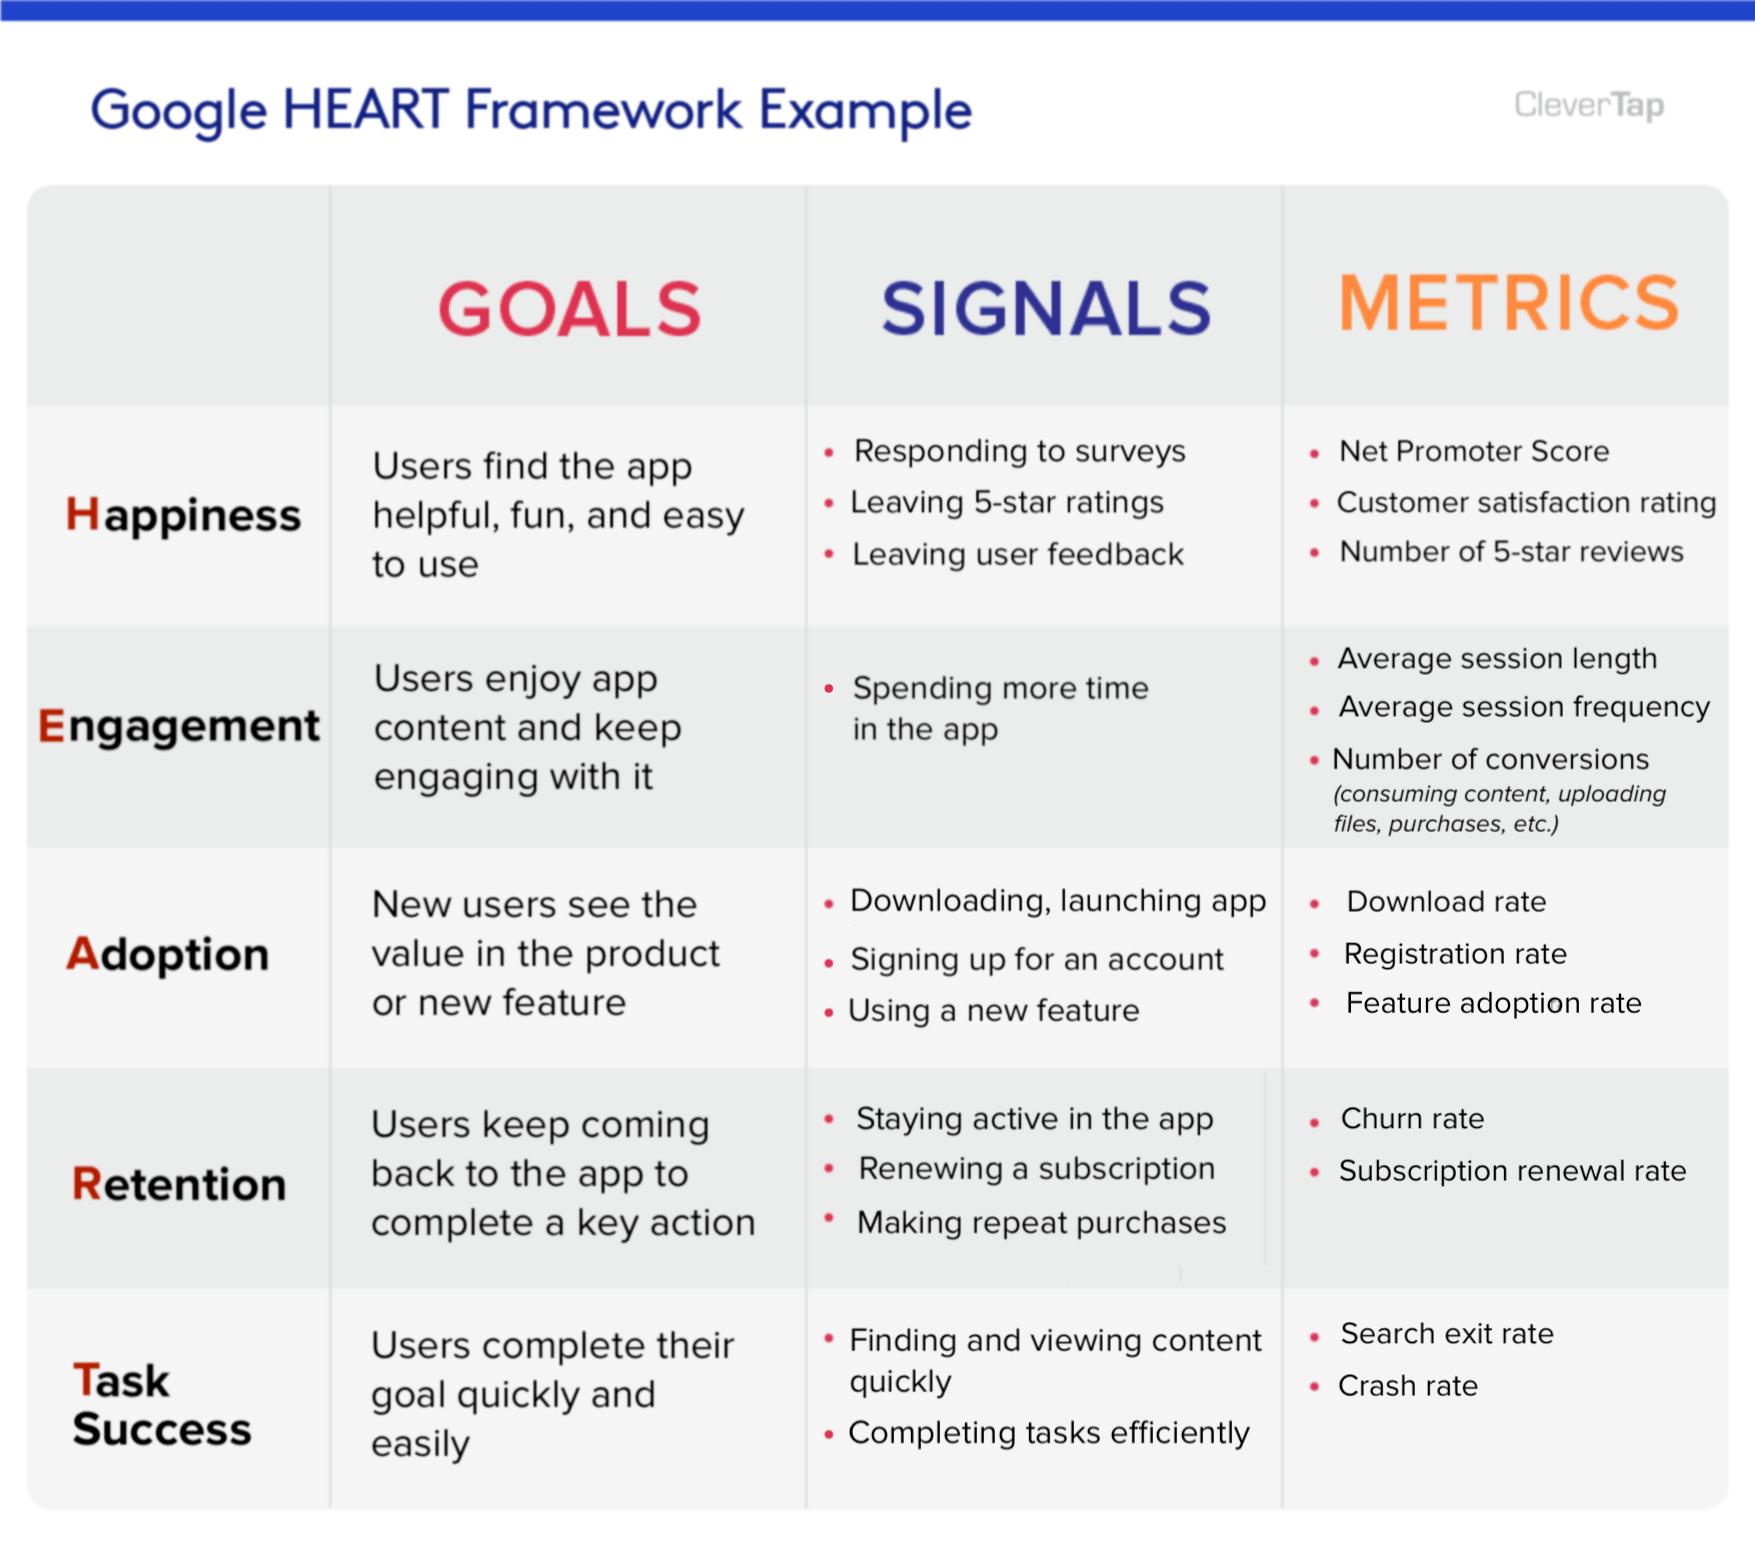 Google HEART Framework